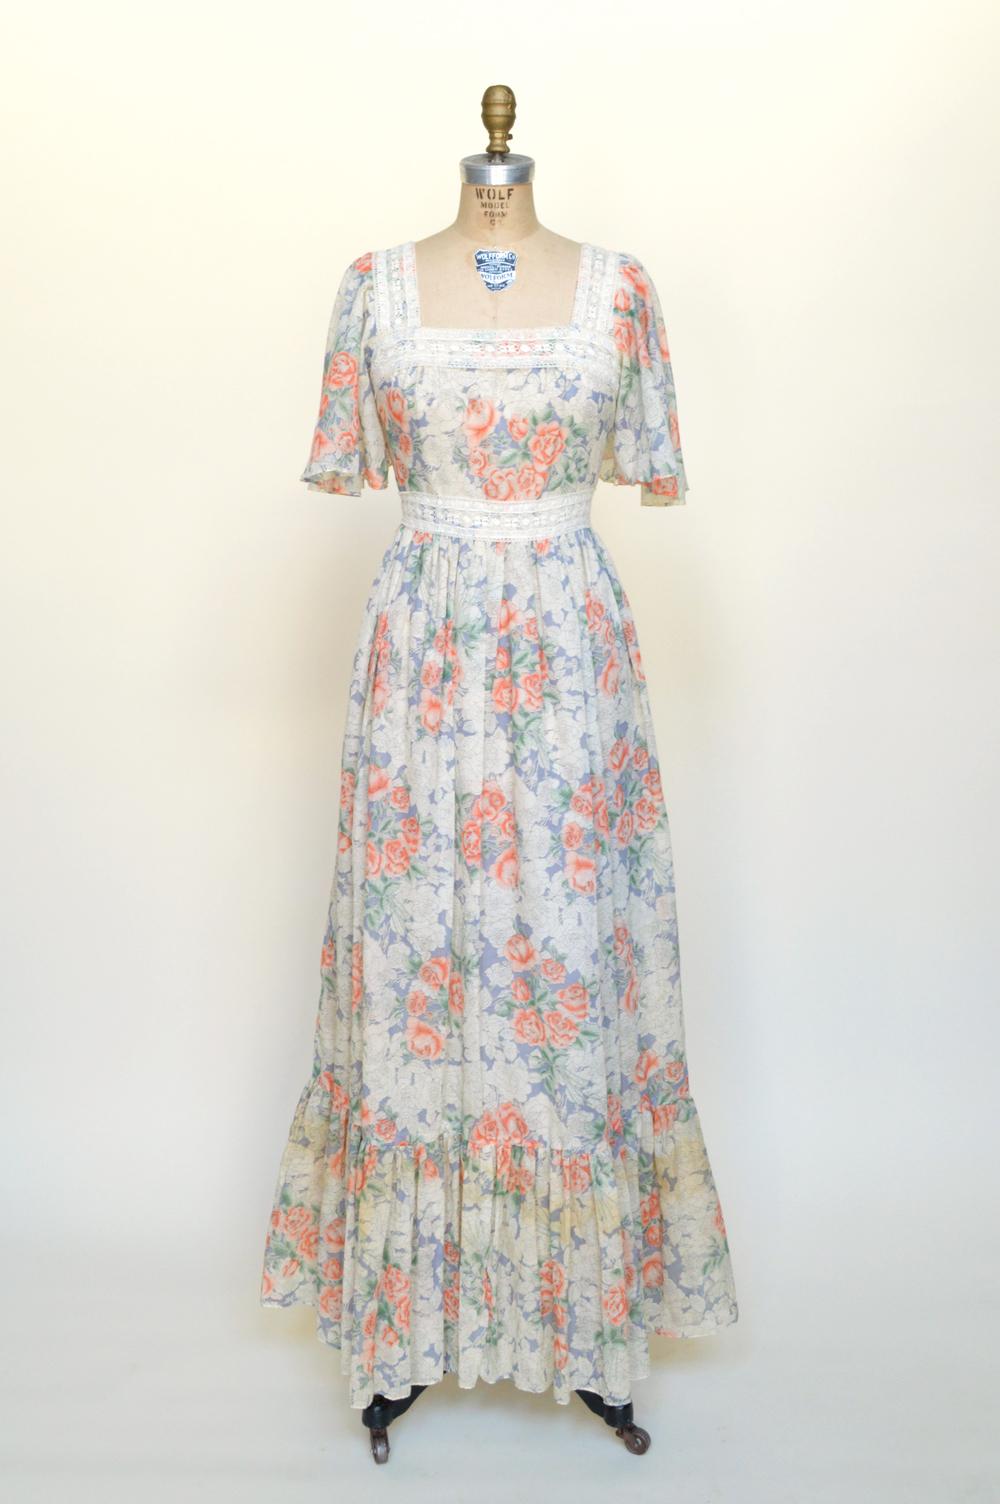 Vintage maxi dress from Dalena Vintage.